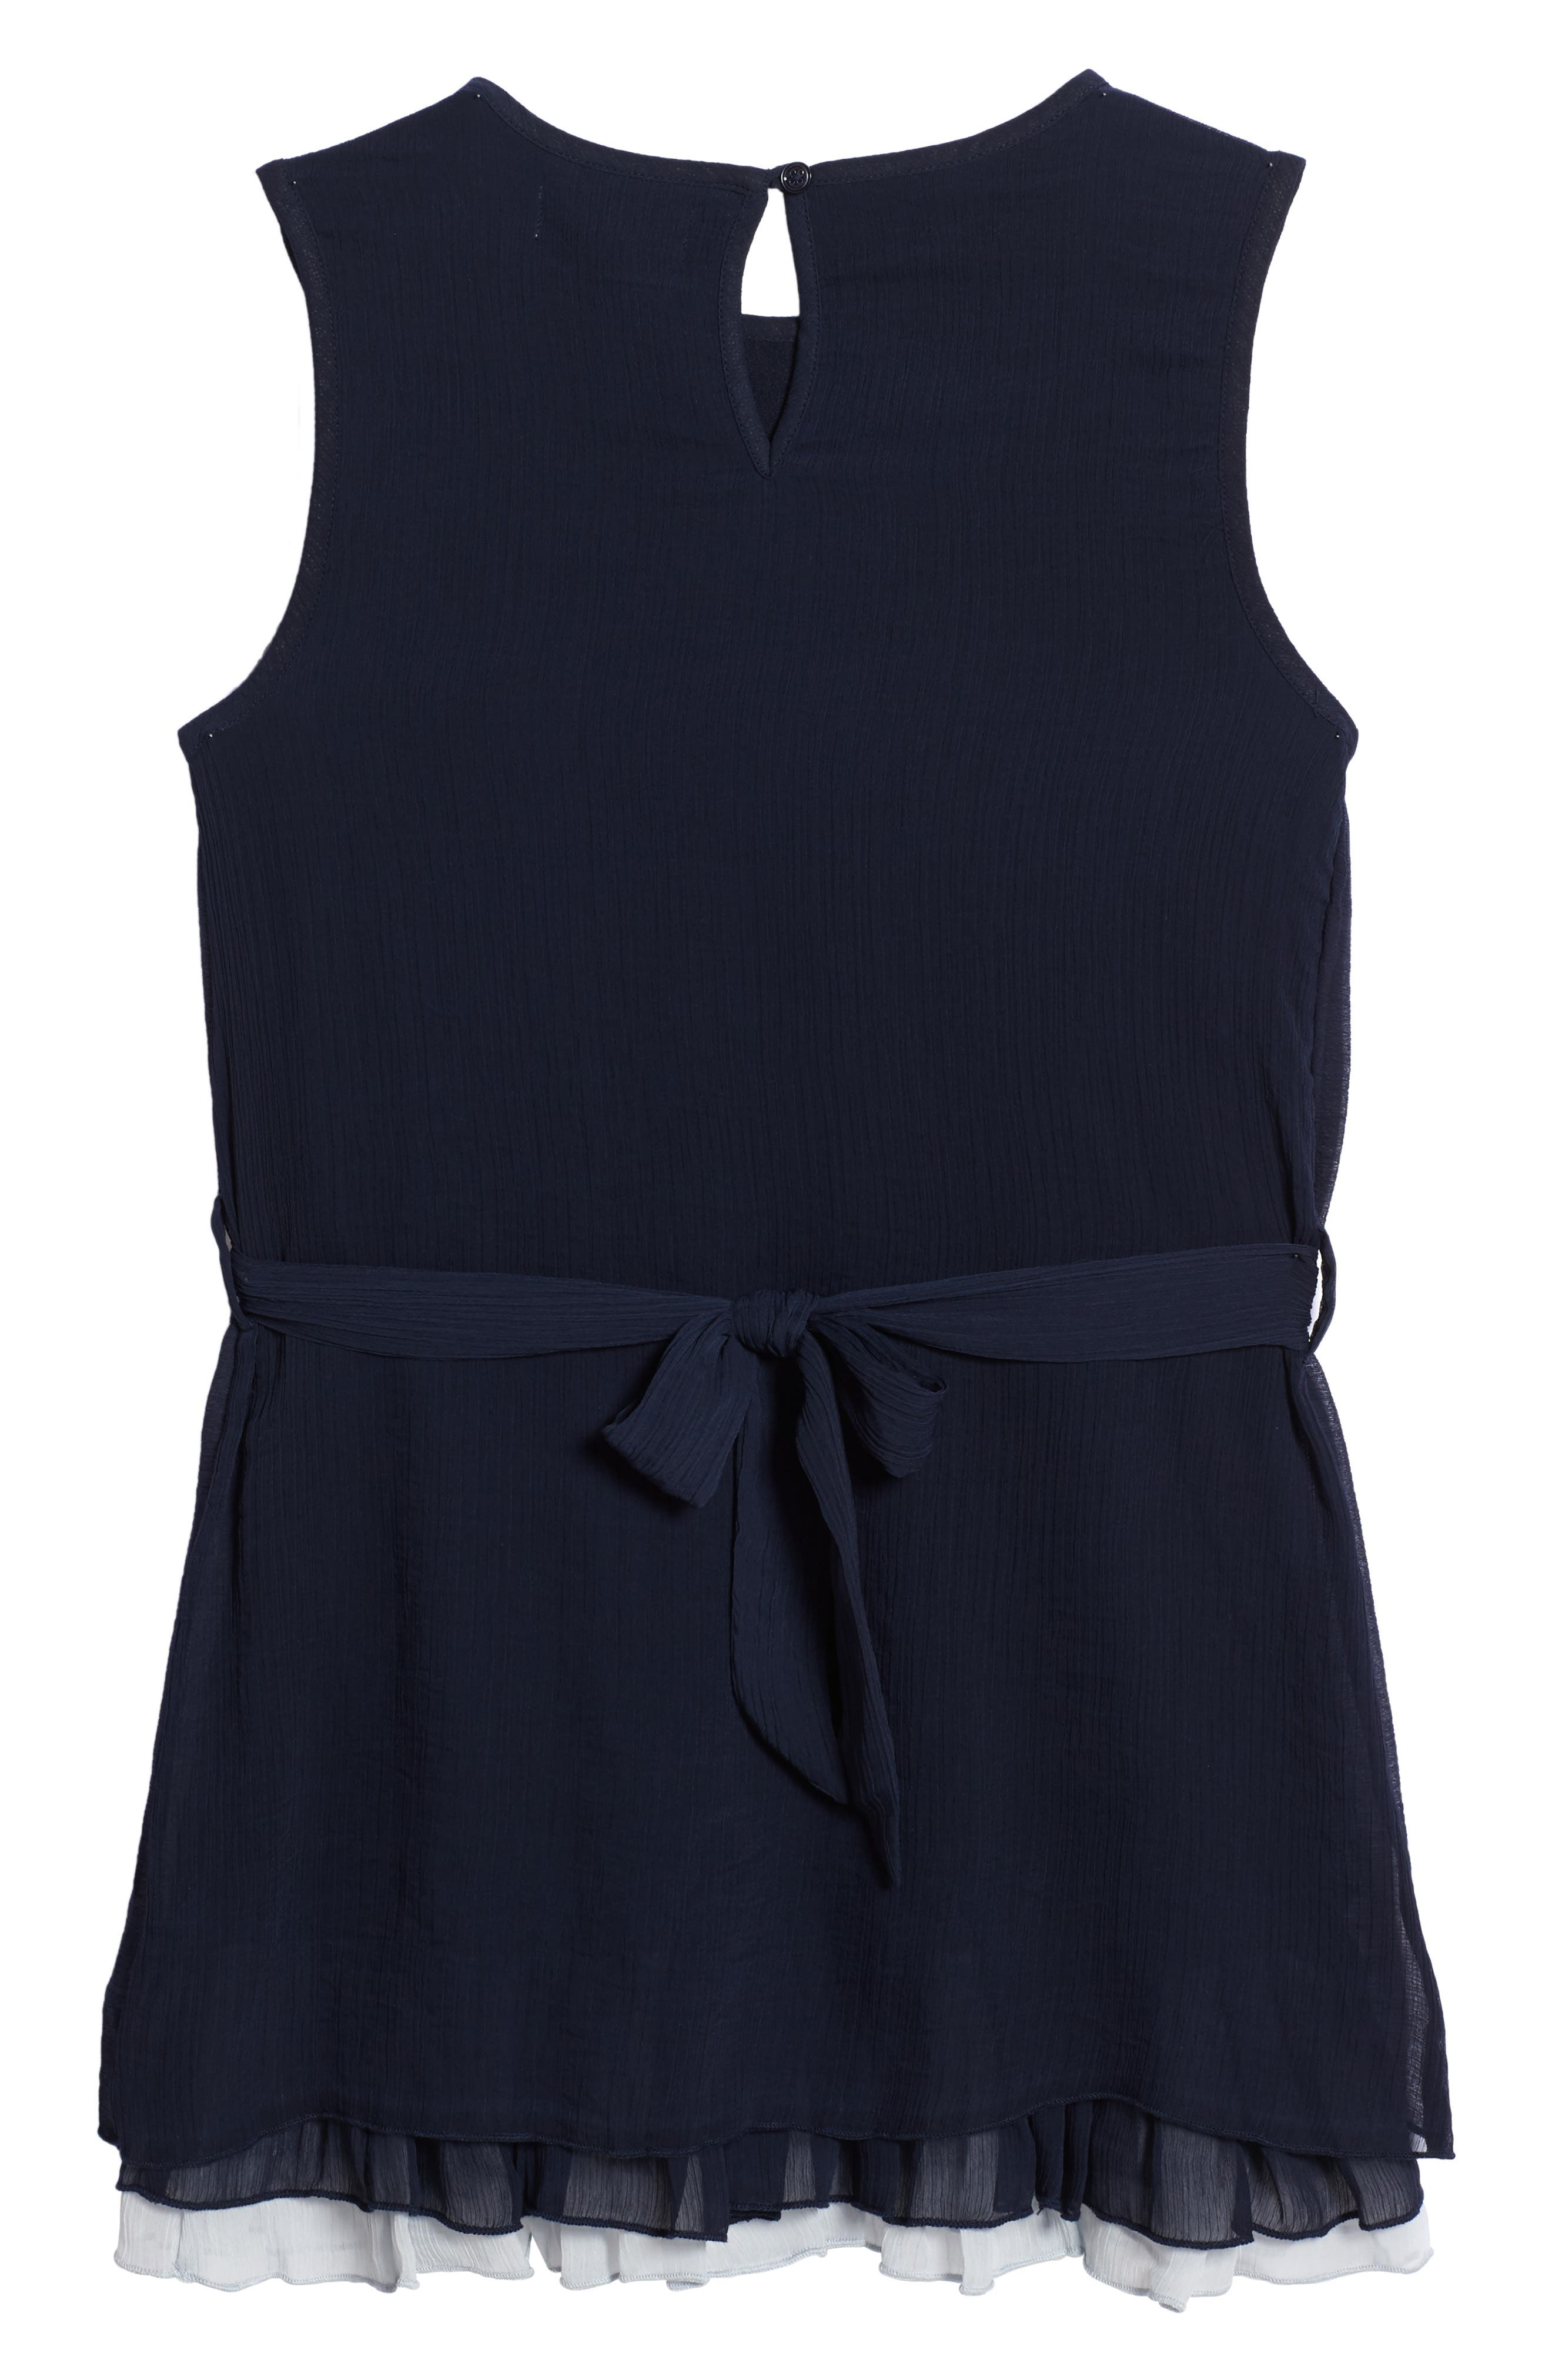 Alternate Image 2  - Peek Stefanie Pleated Dress (Toddler Girls, Little Girls & Big Girls)